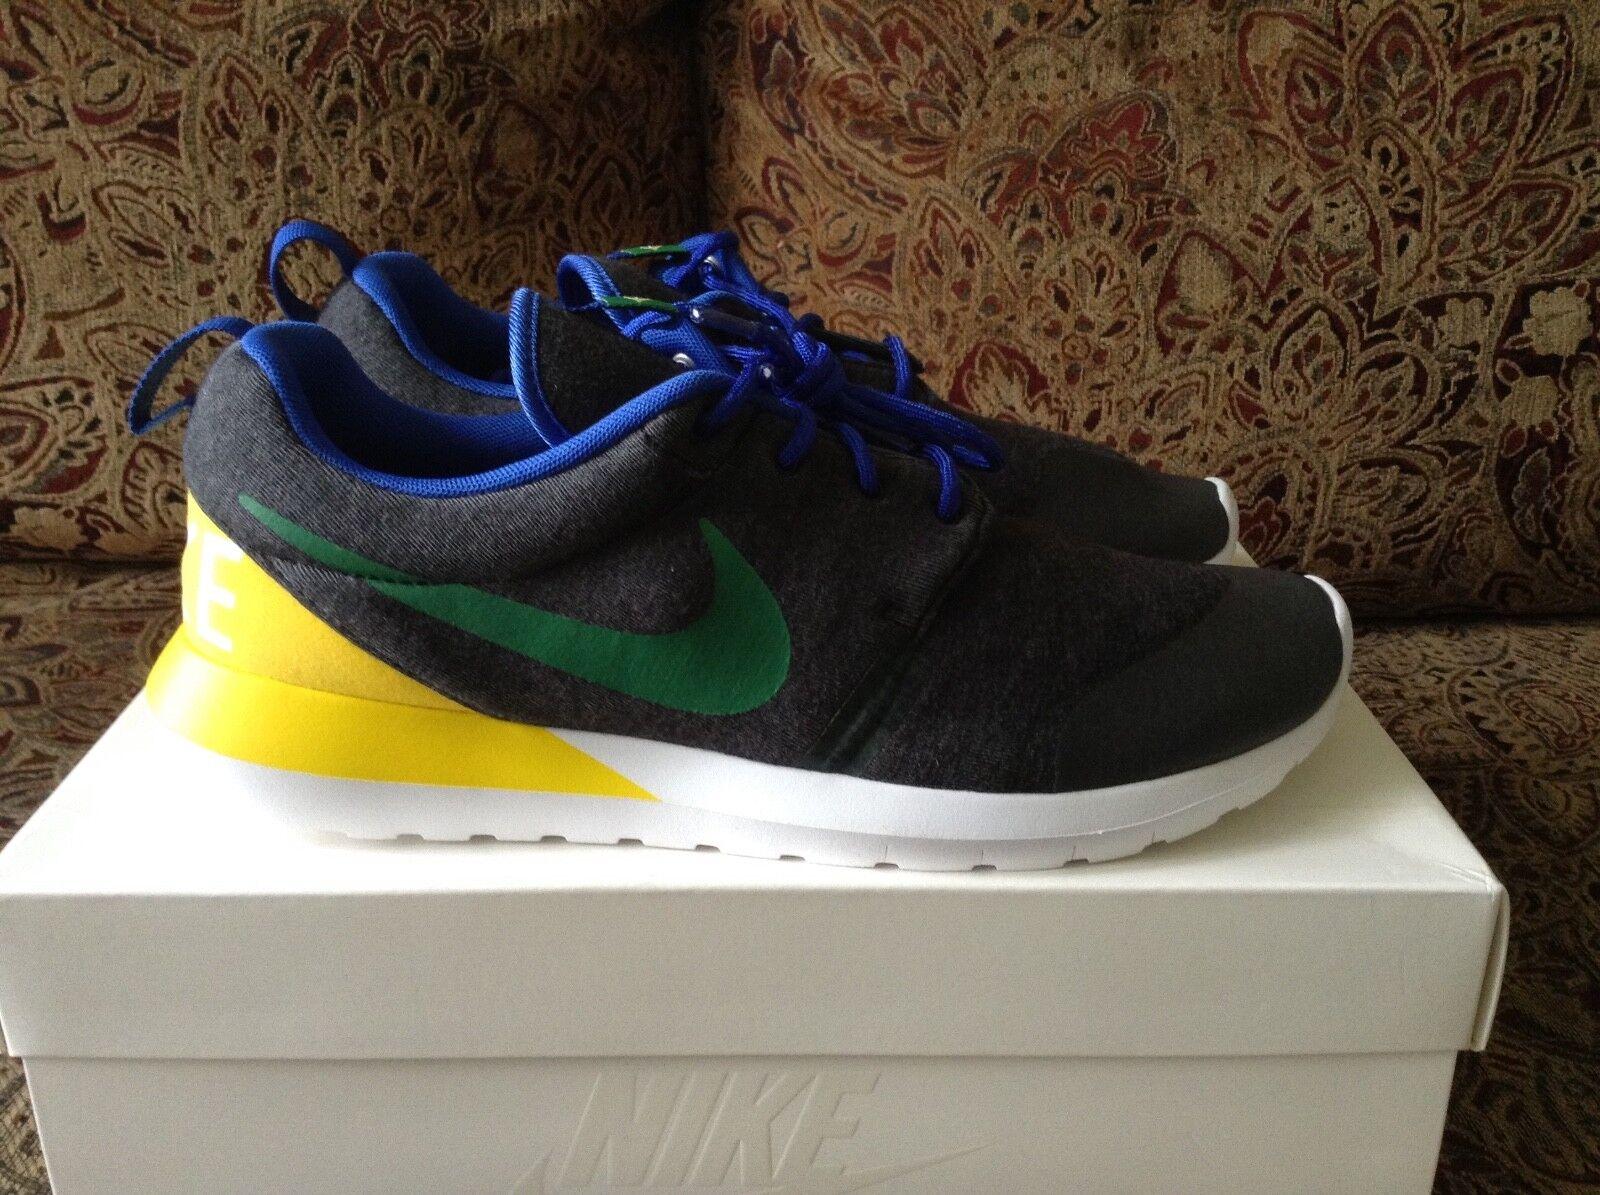 Nike Rosherun NM W SP Brazil 652804-037 Size 9